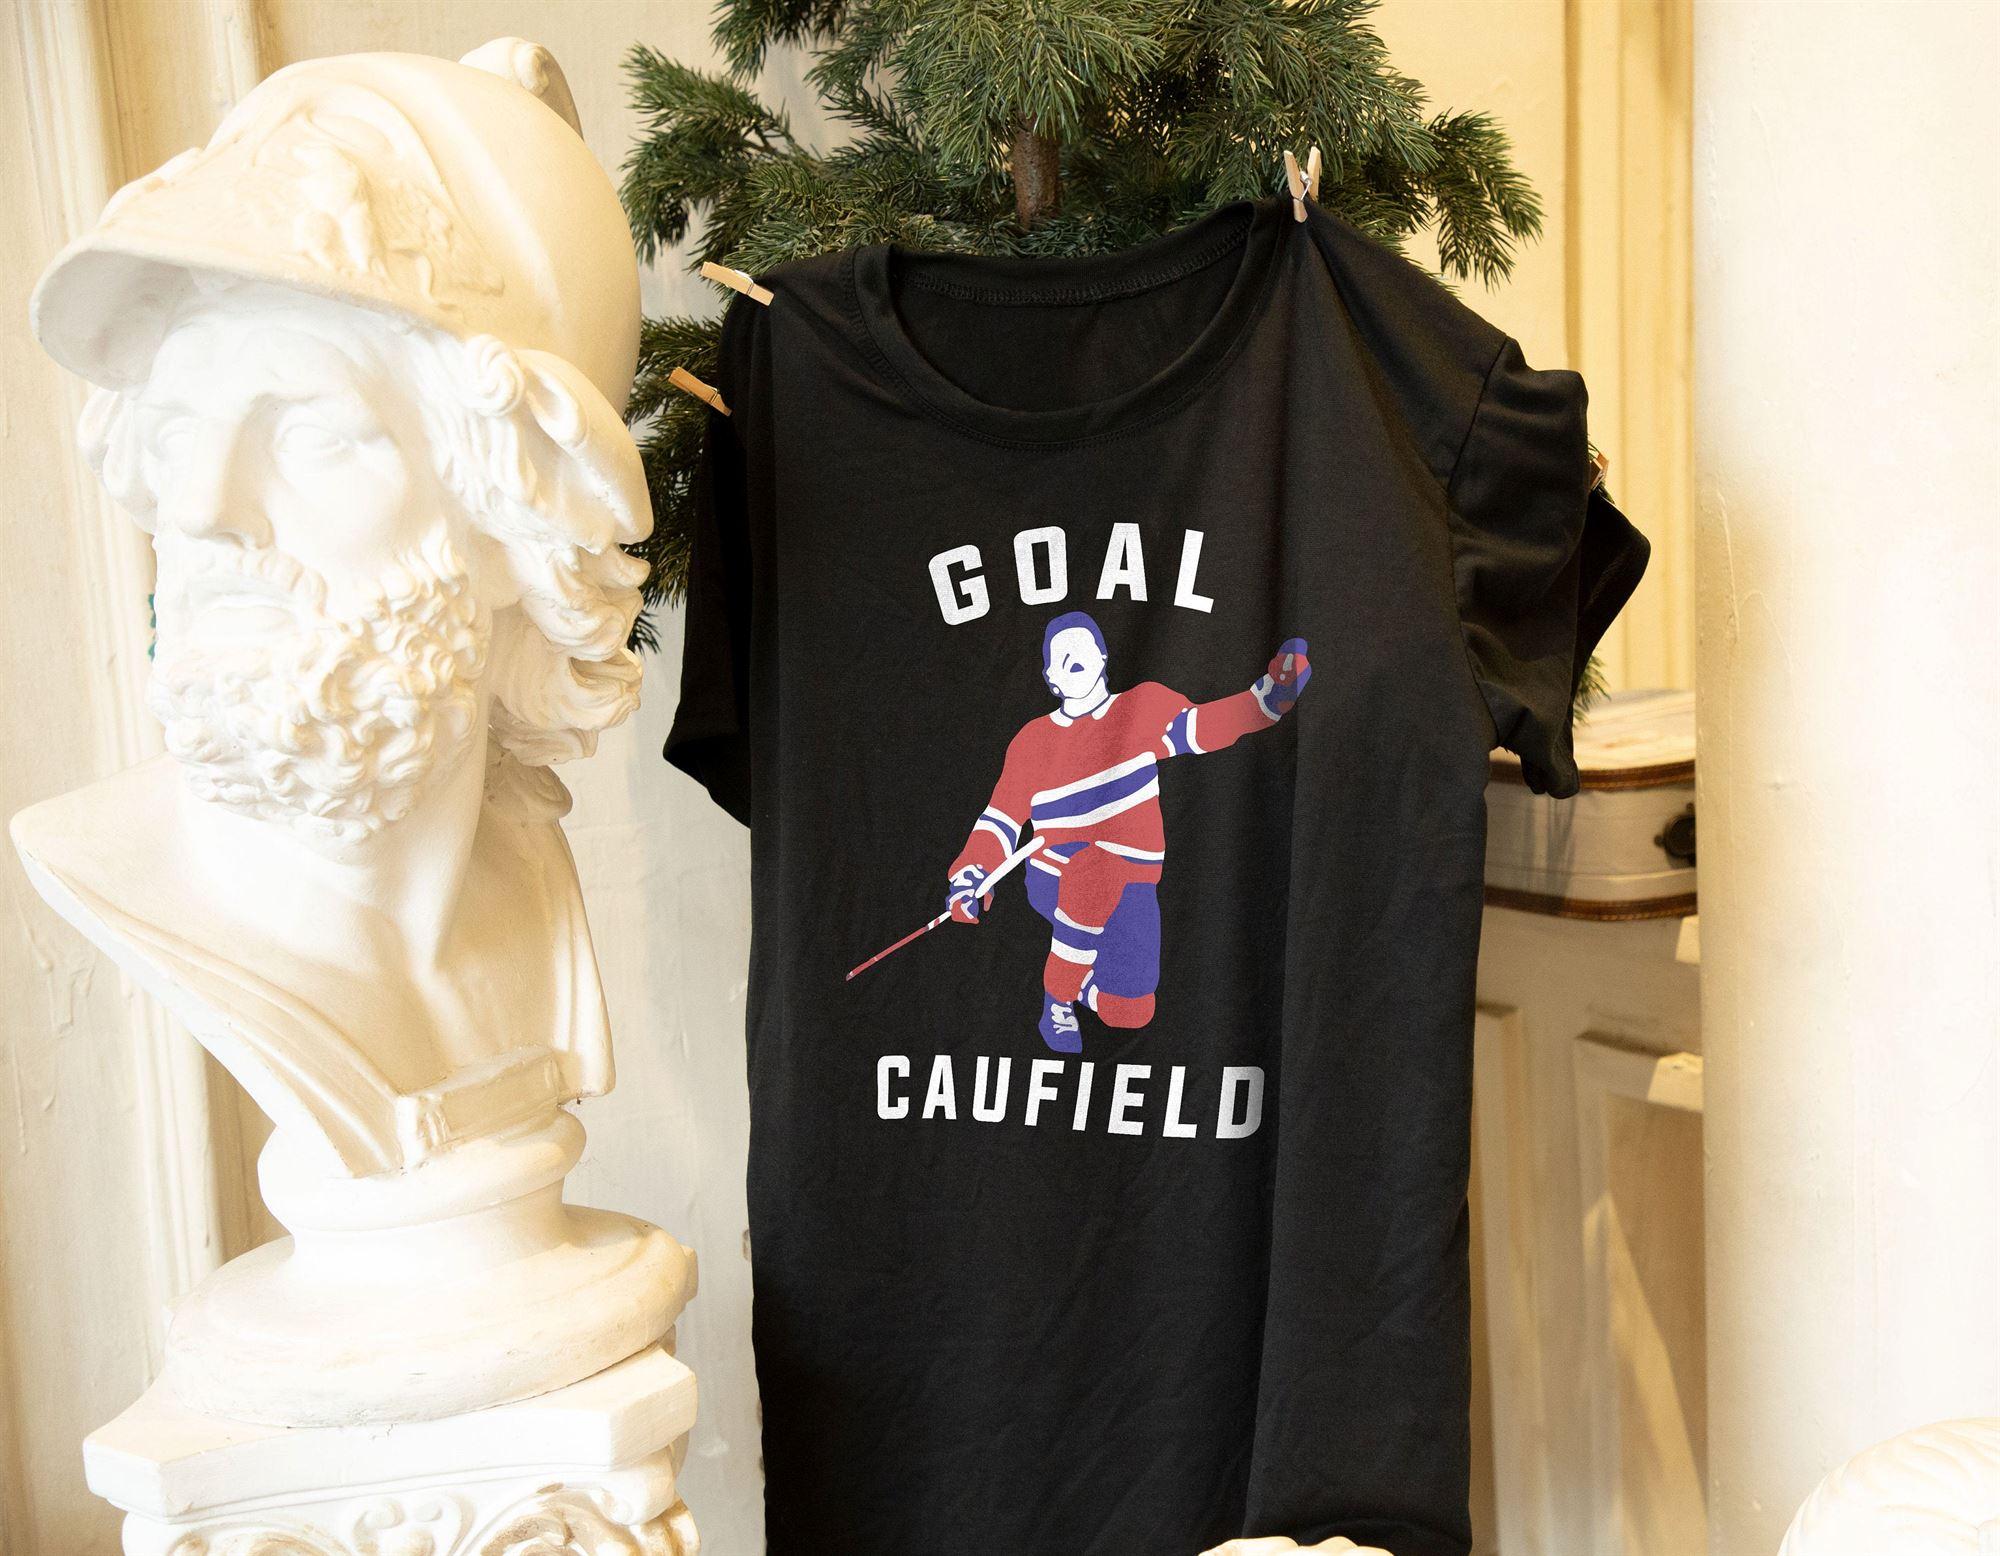 Goal Caufield T-shirt Funny Hockey Goal Caufield Shirt Cole Caufield Shirt